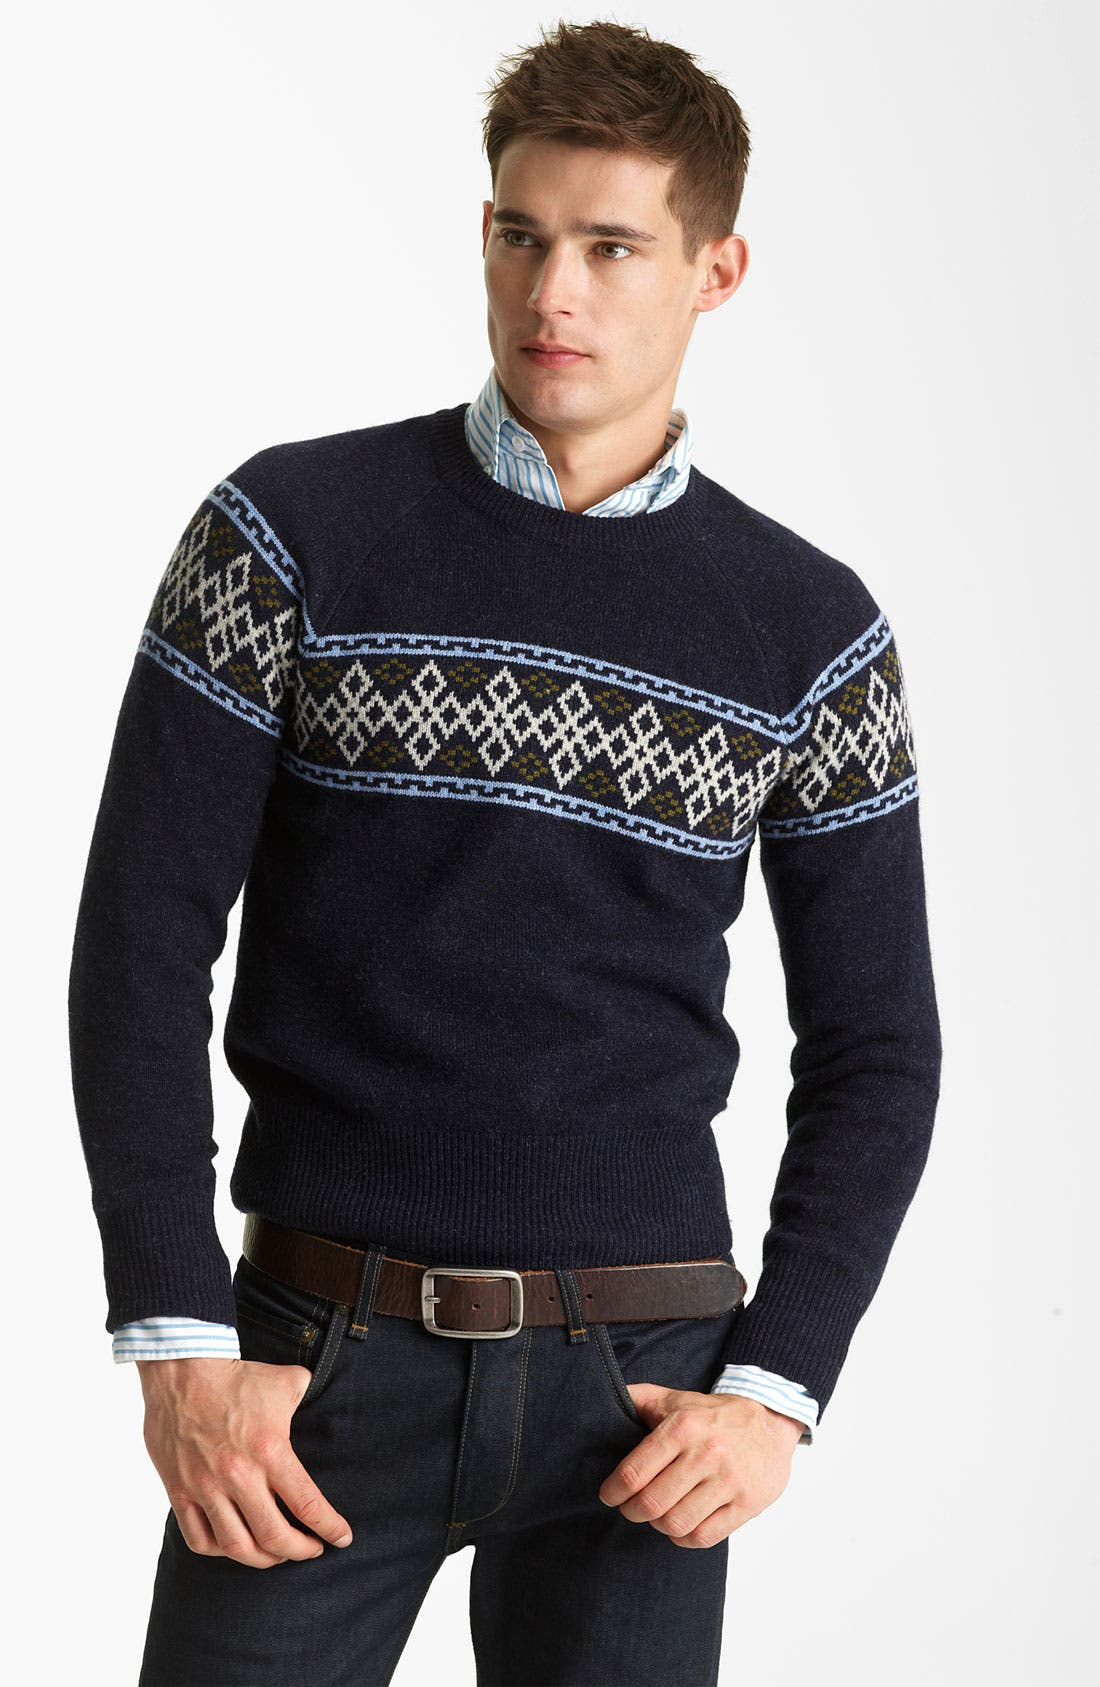 Main Image - Gant by Michael Bastian Wool Crewneck Sweater